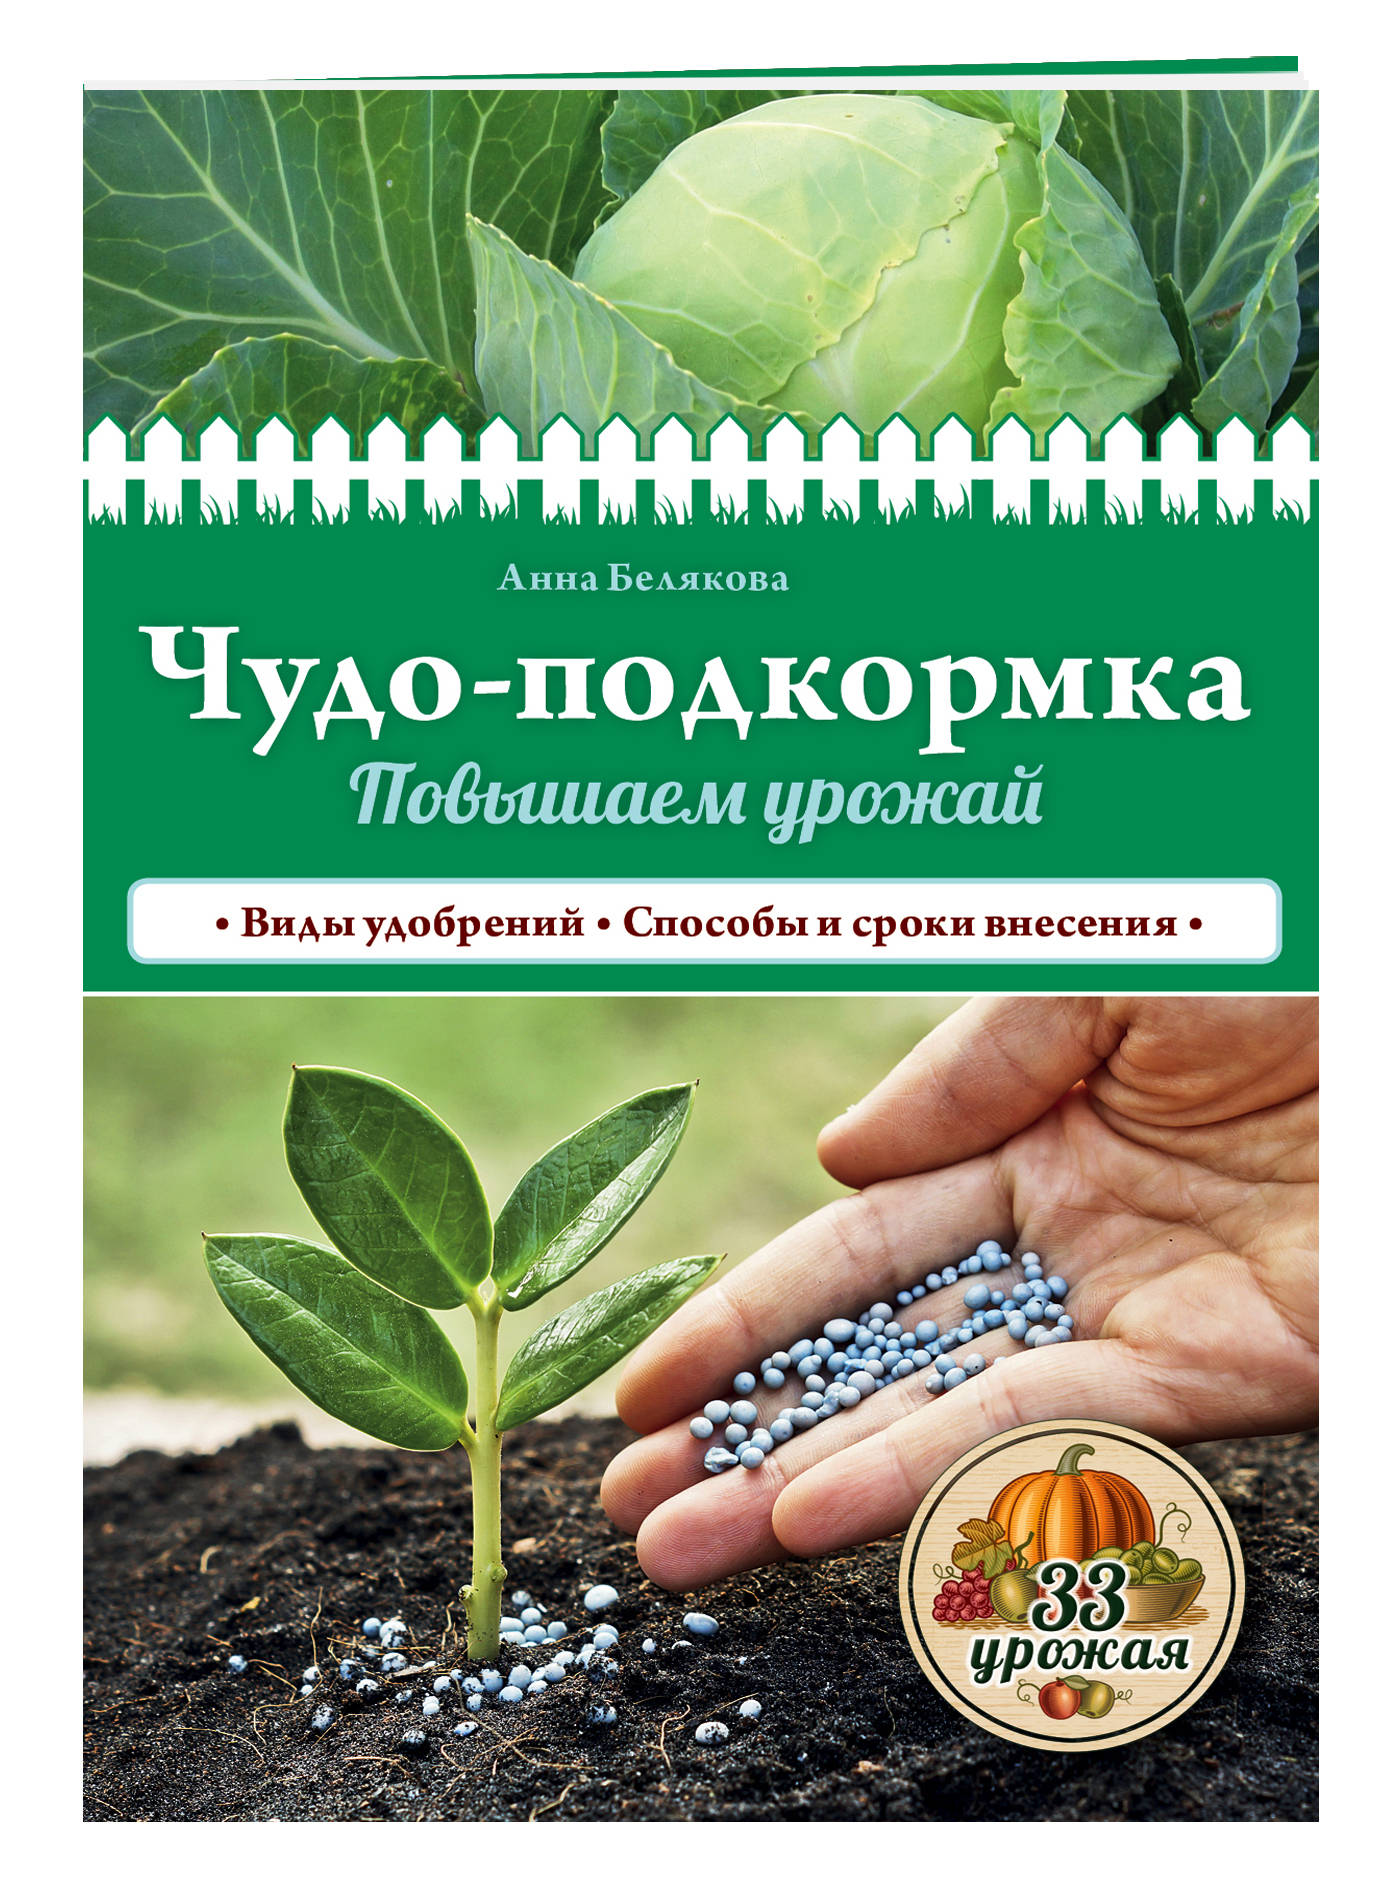 Белякова А.В. Чудо-подкормка: повышаем урожай анна белякова чудо подкормка повышаем урожай